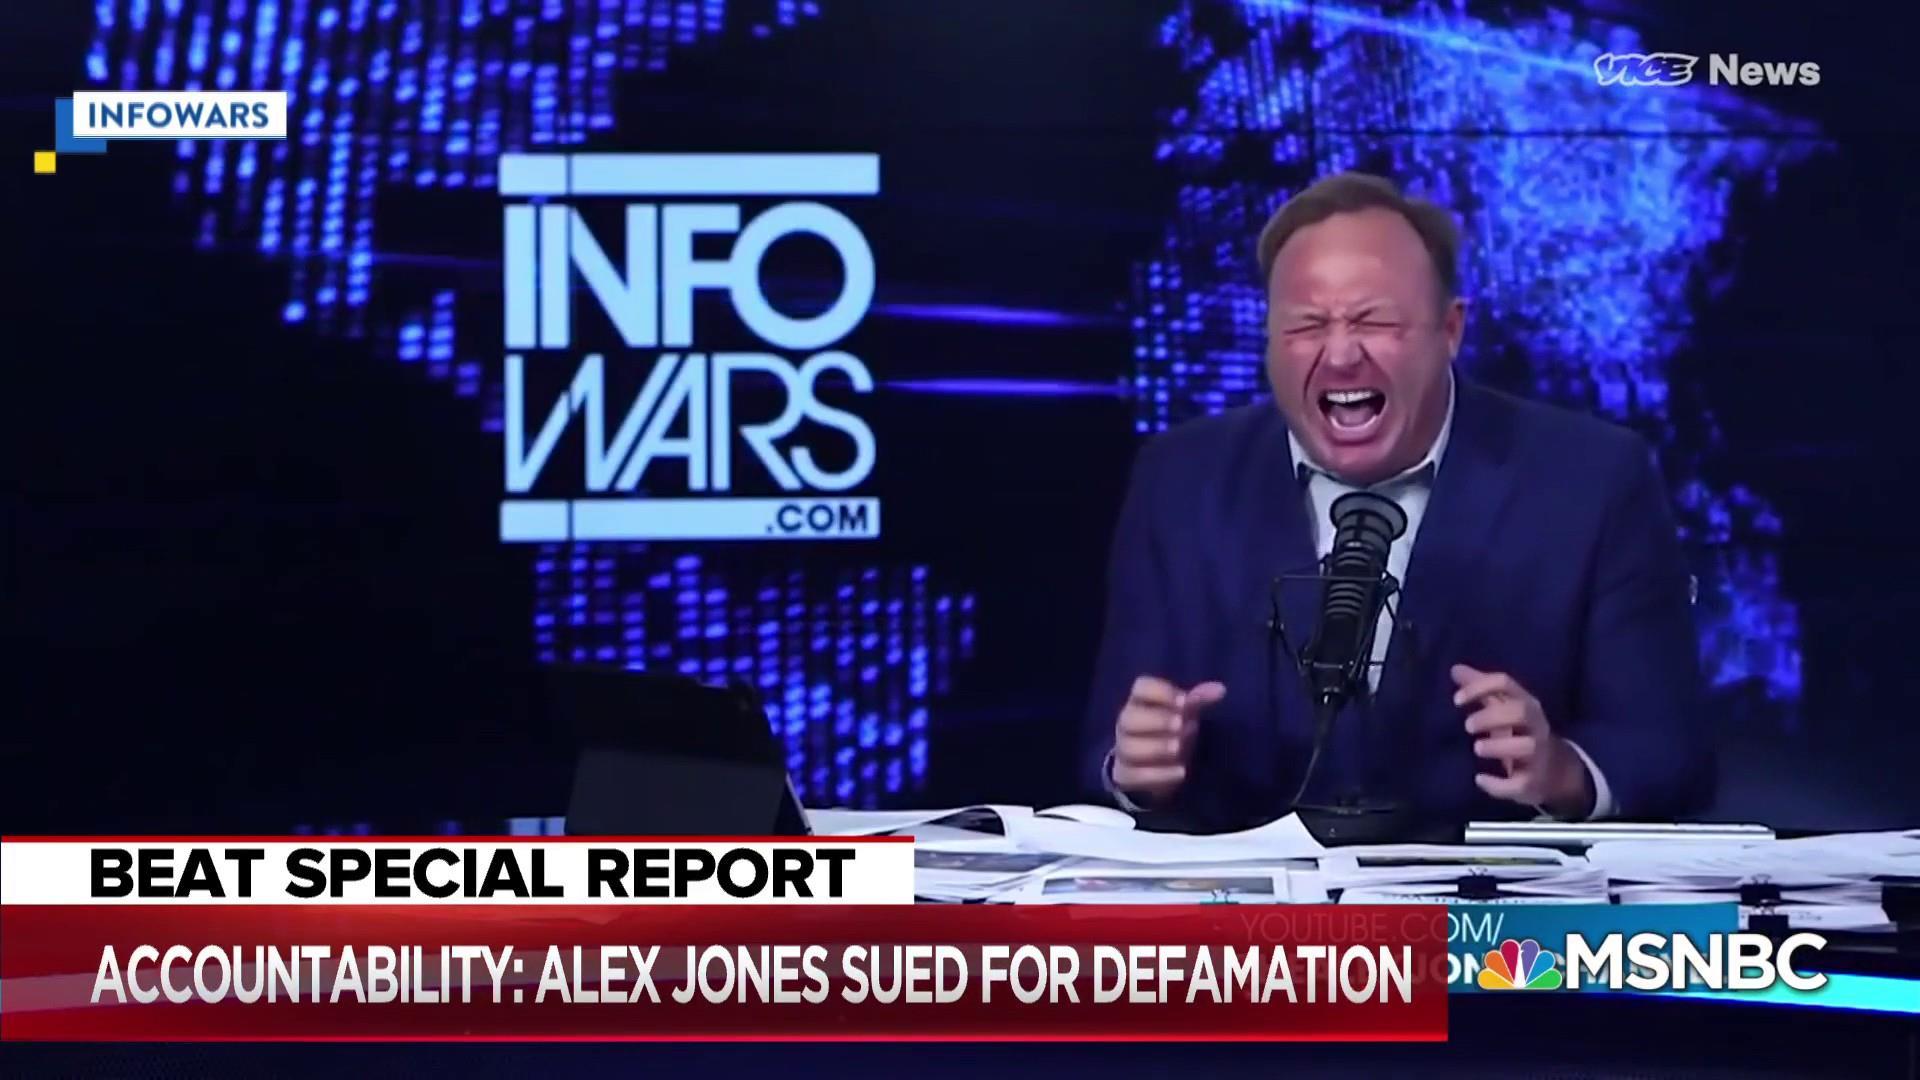 Ari Melber: 1st amendment doesn't protect Alex Jones defamation